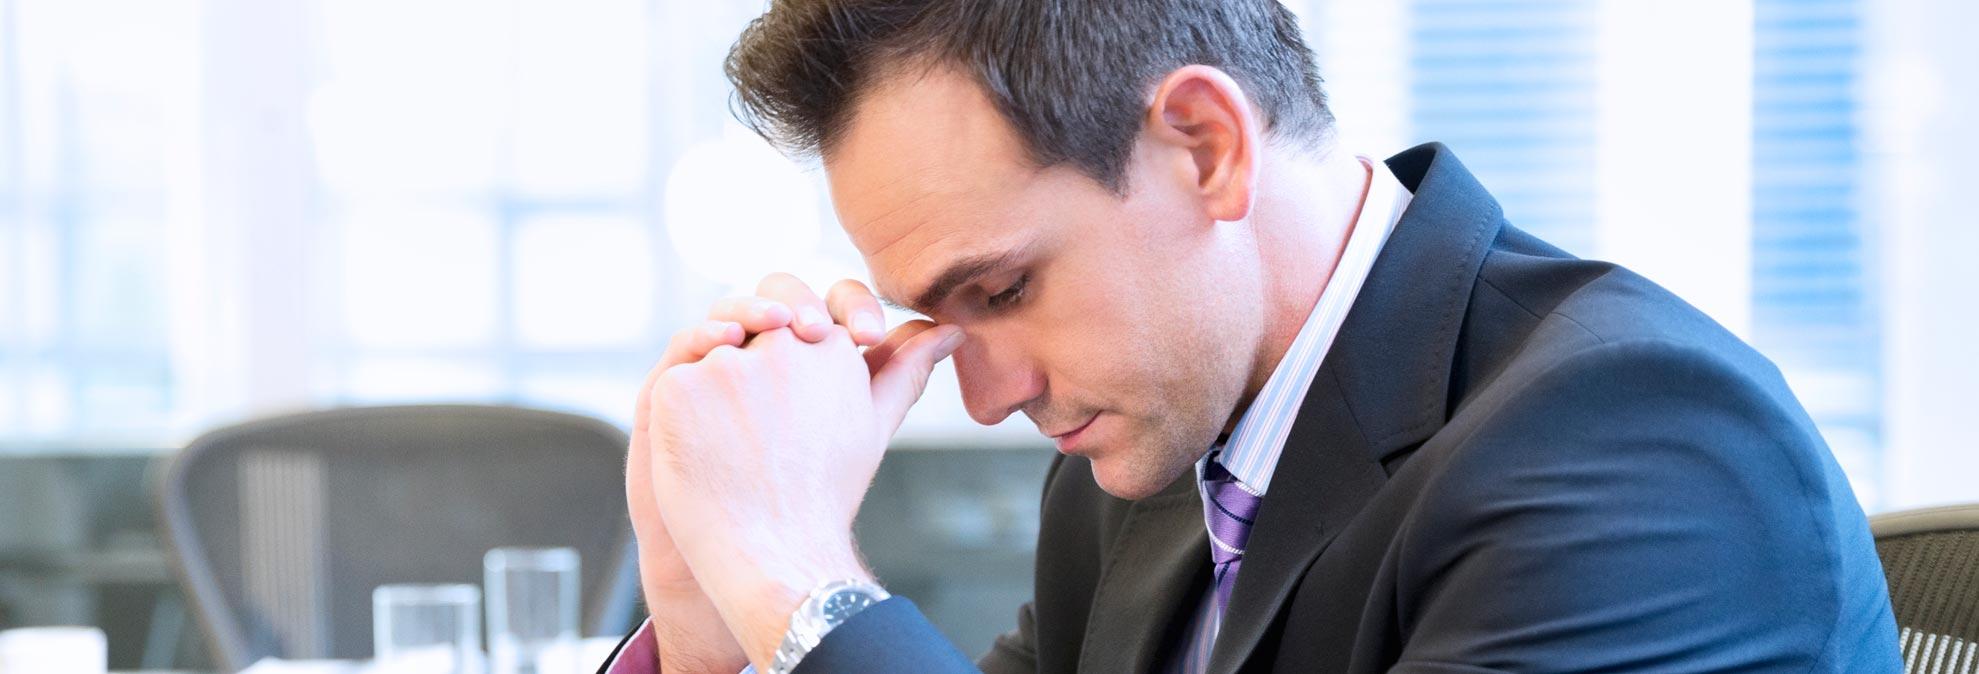 Tension Headache Treatment And Prevention Consumer Reports